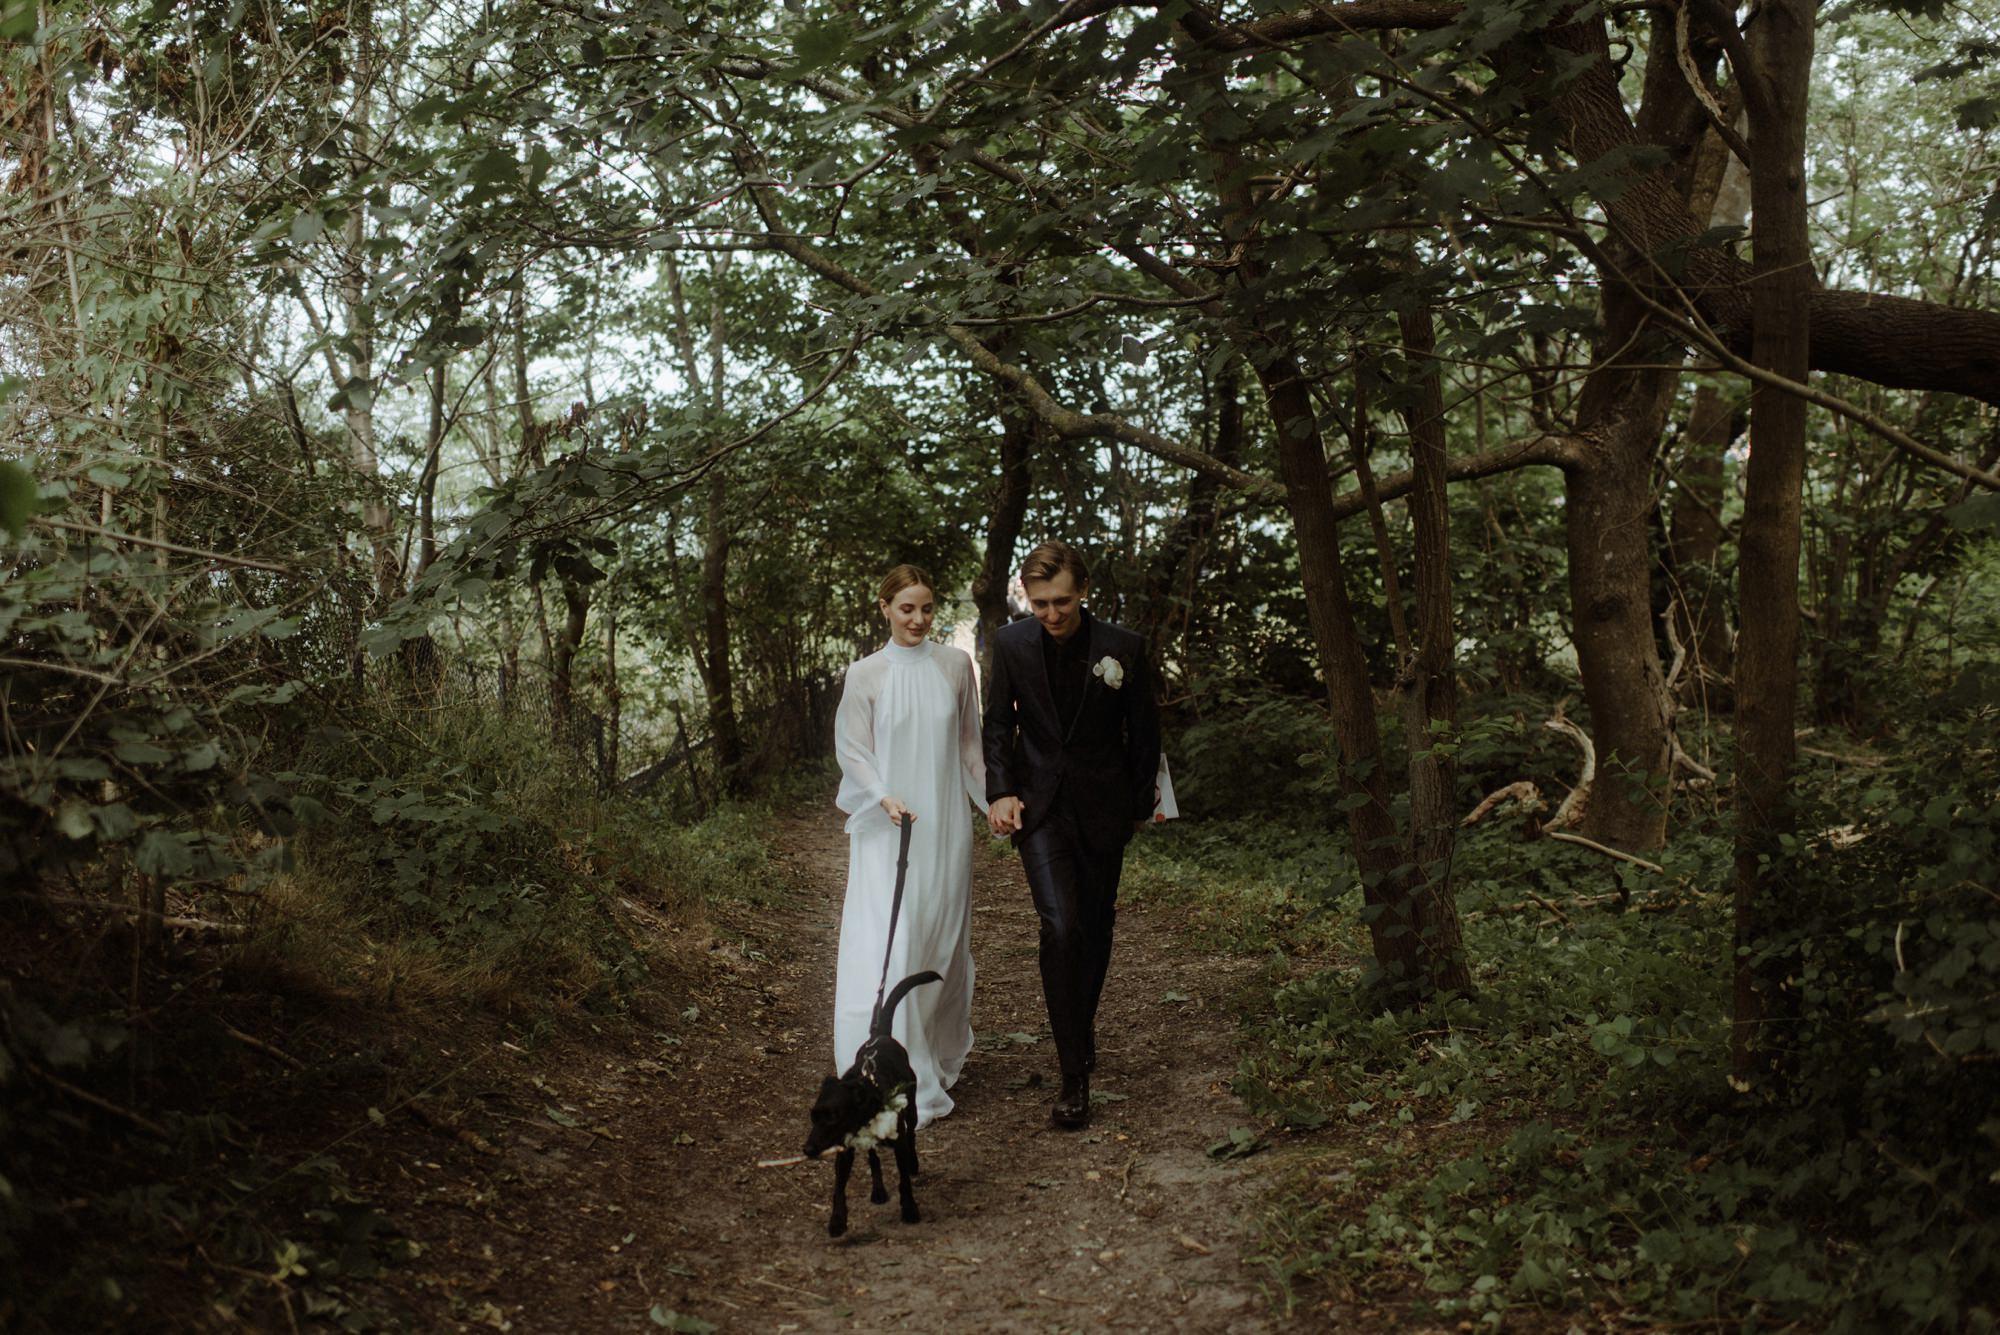 copenhagen wedding photography 0017 1